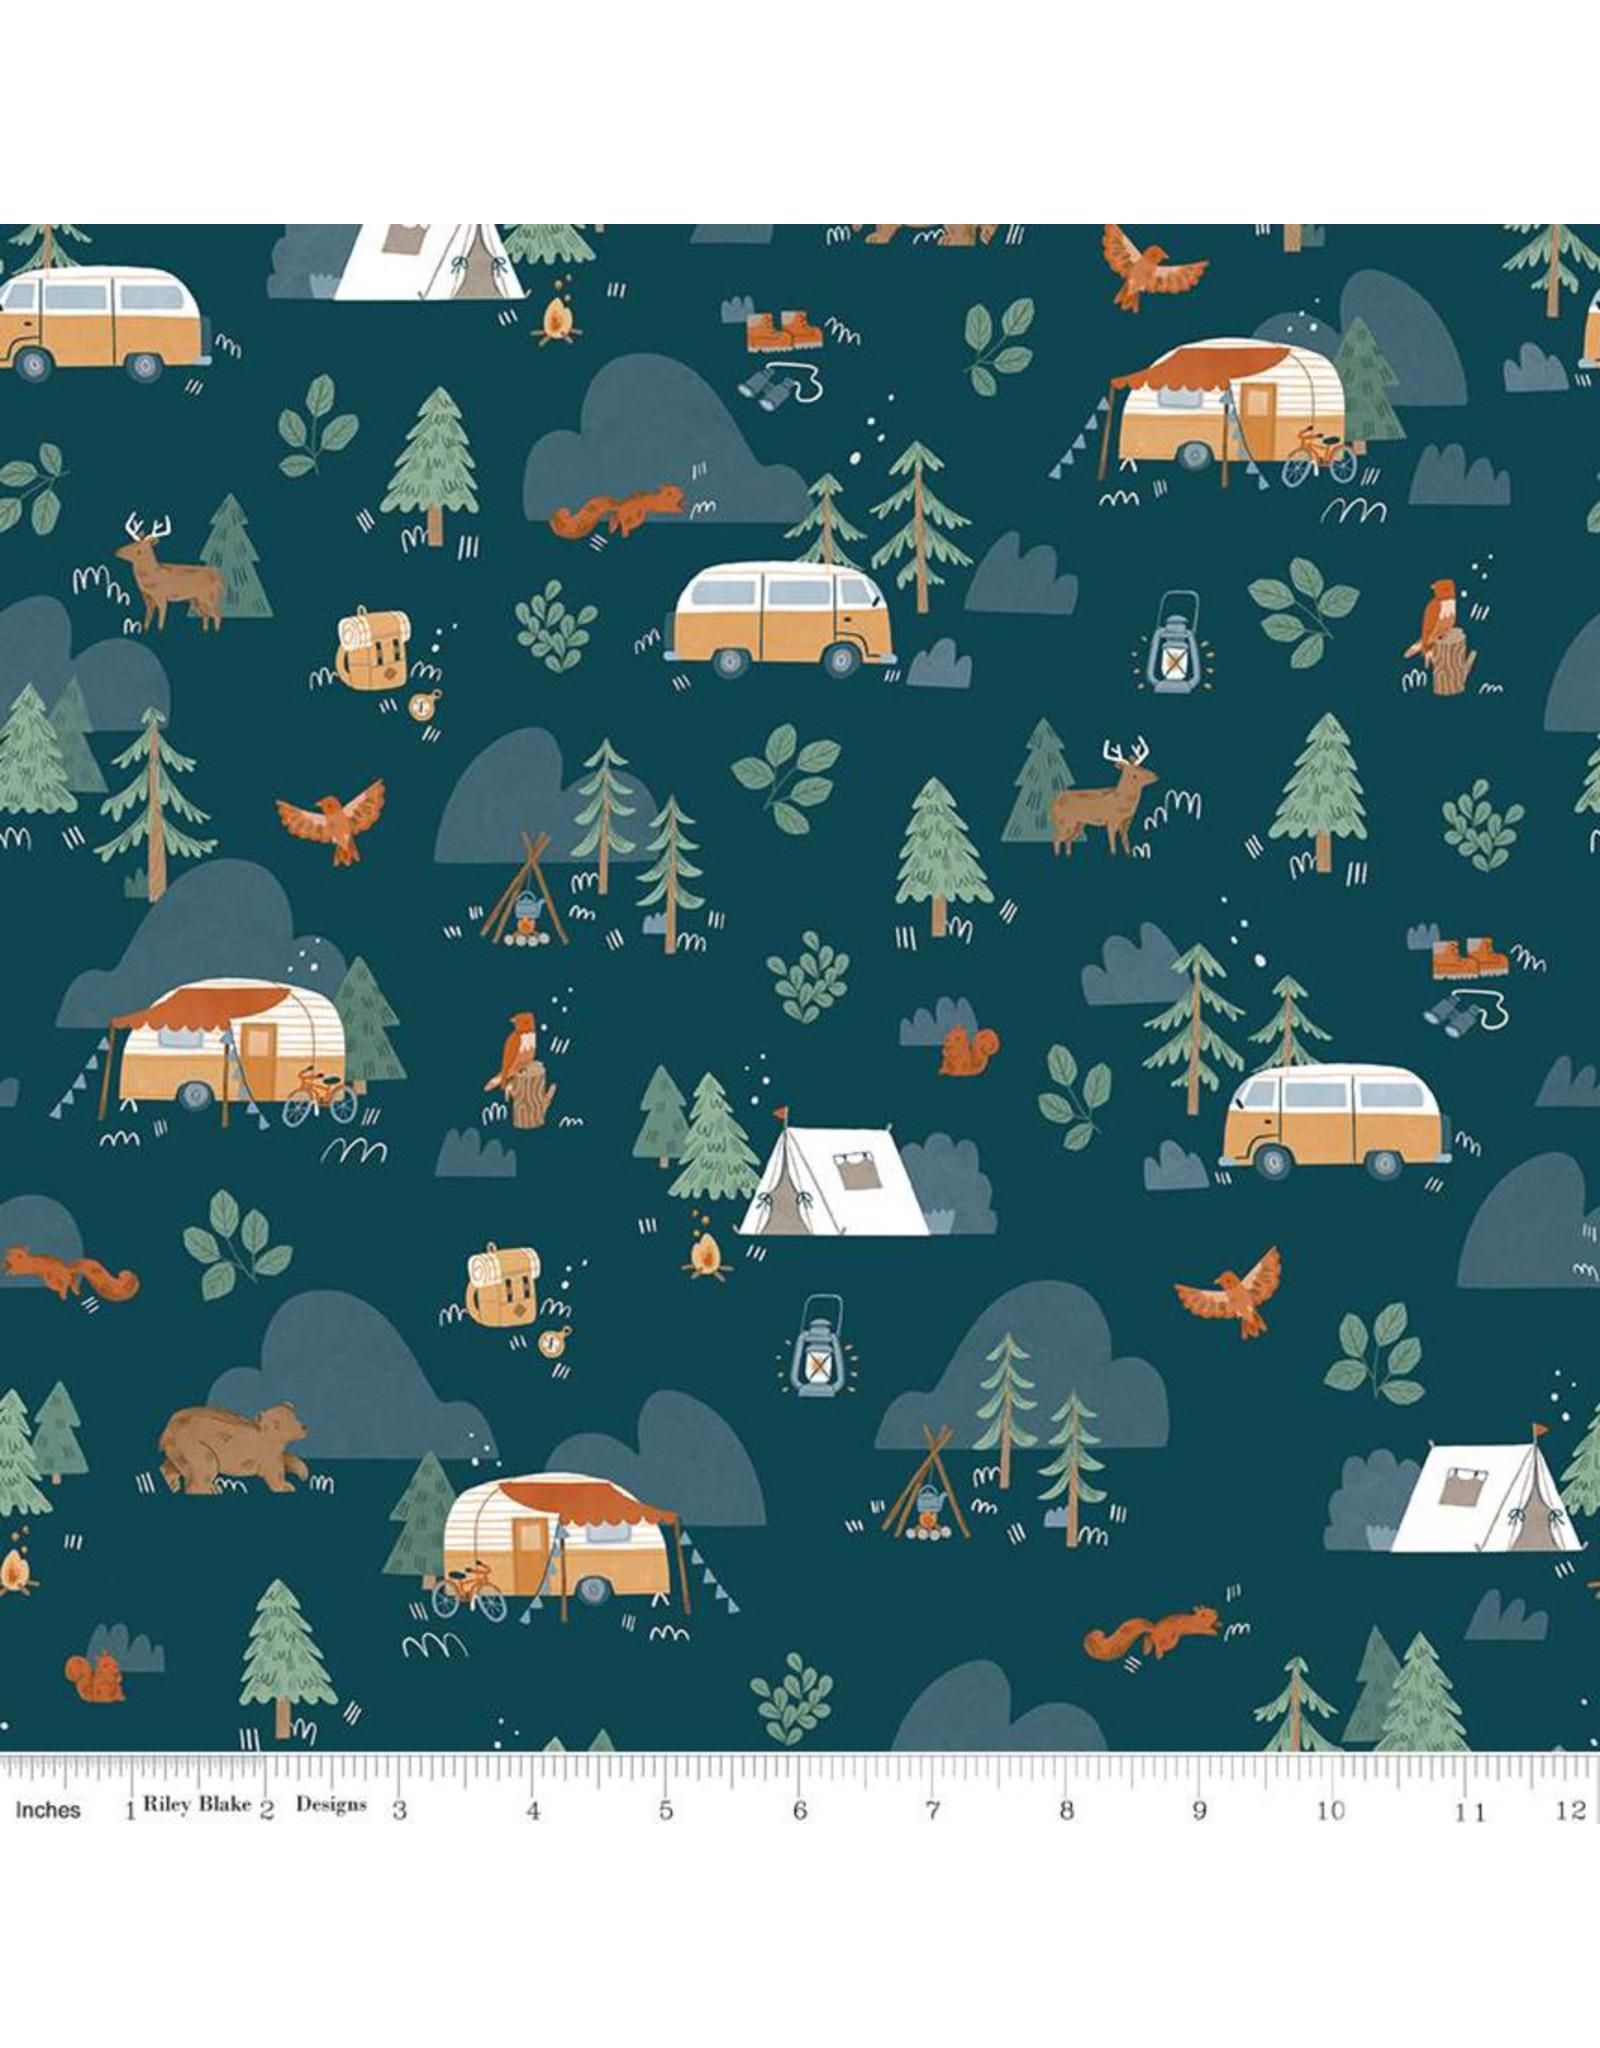 Riley Blake Fabrics Camp Woodland, Camping in Navy, Fabric Half-Yards